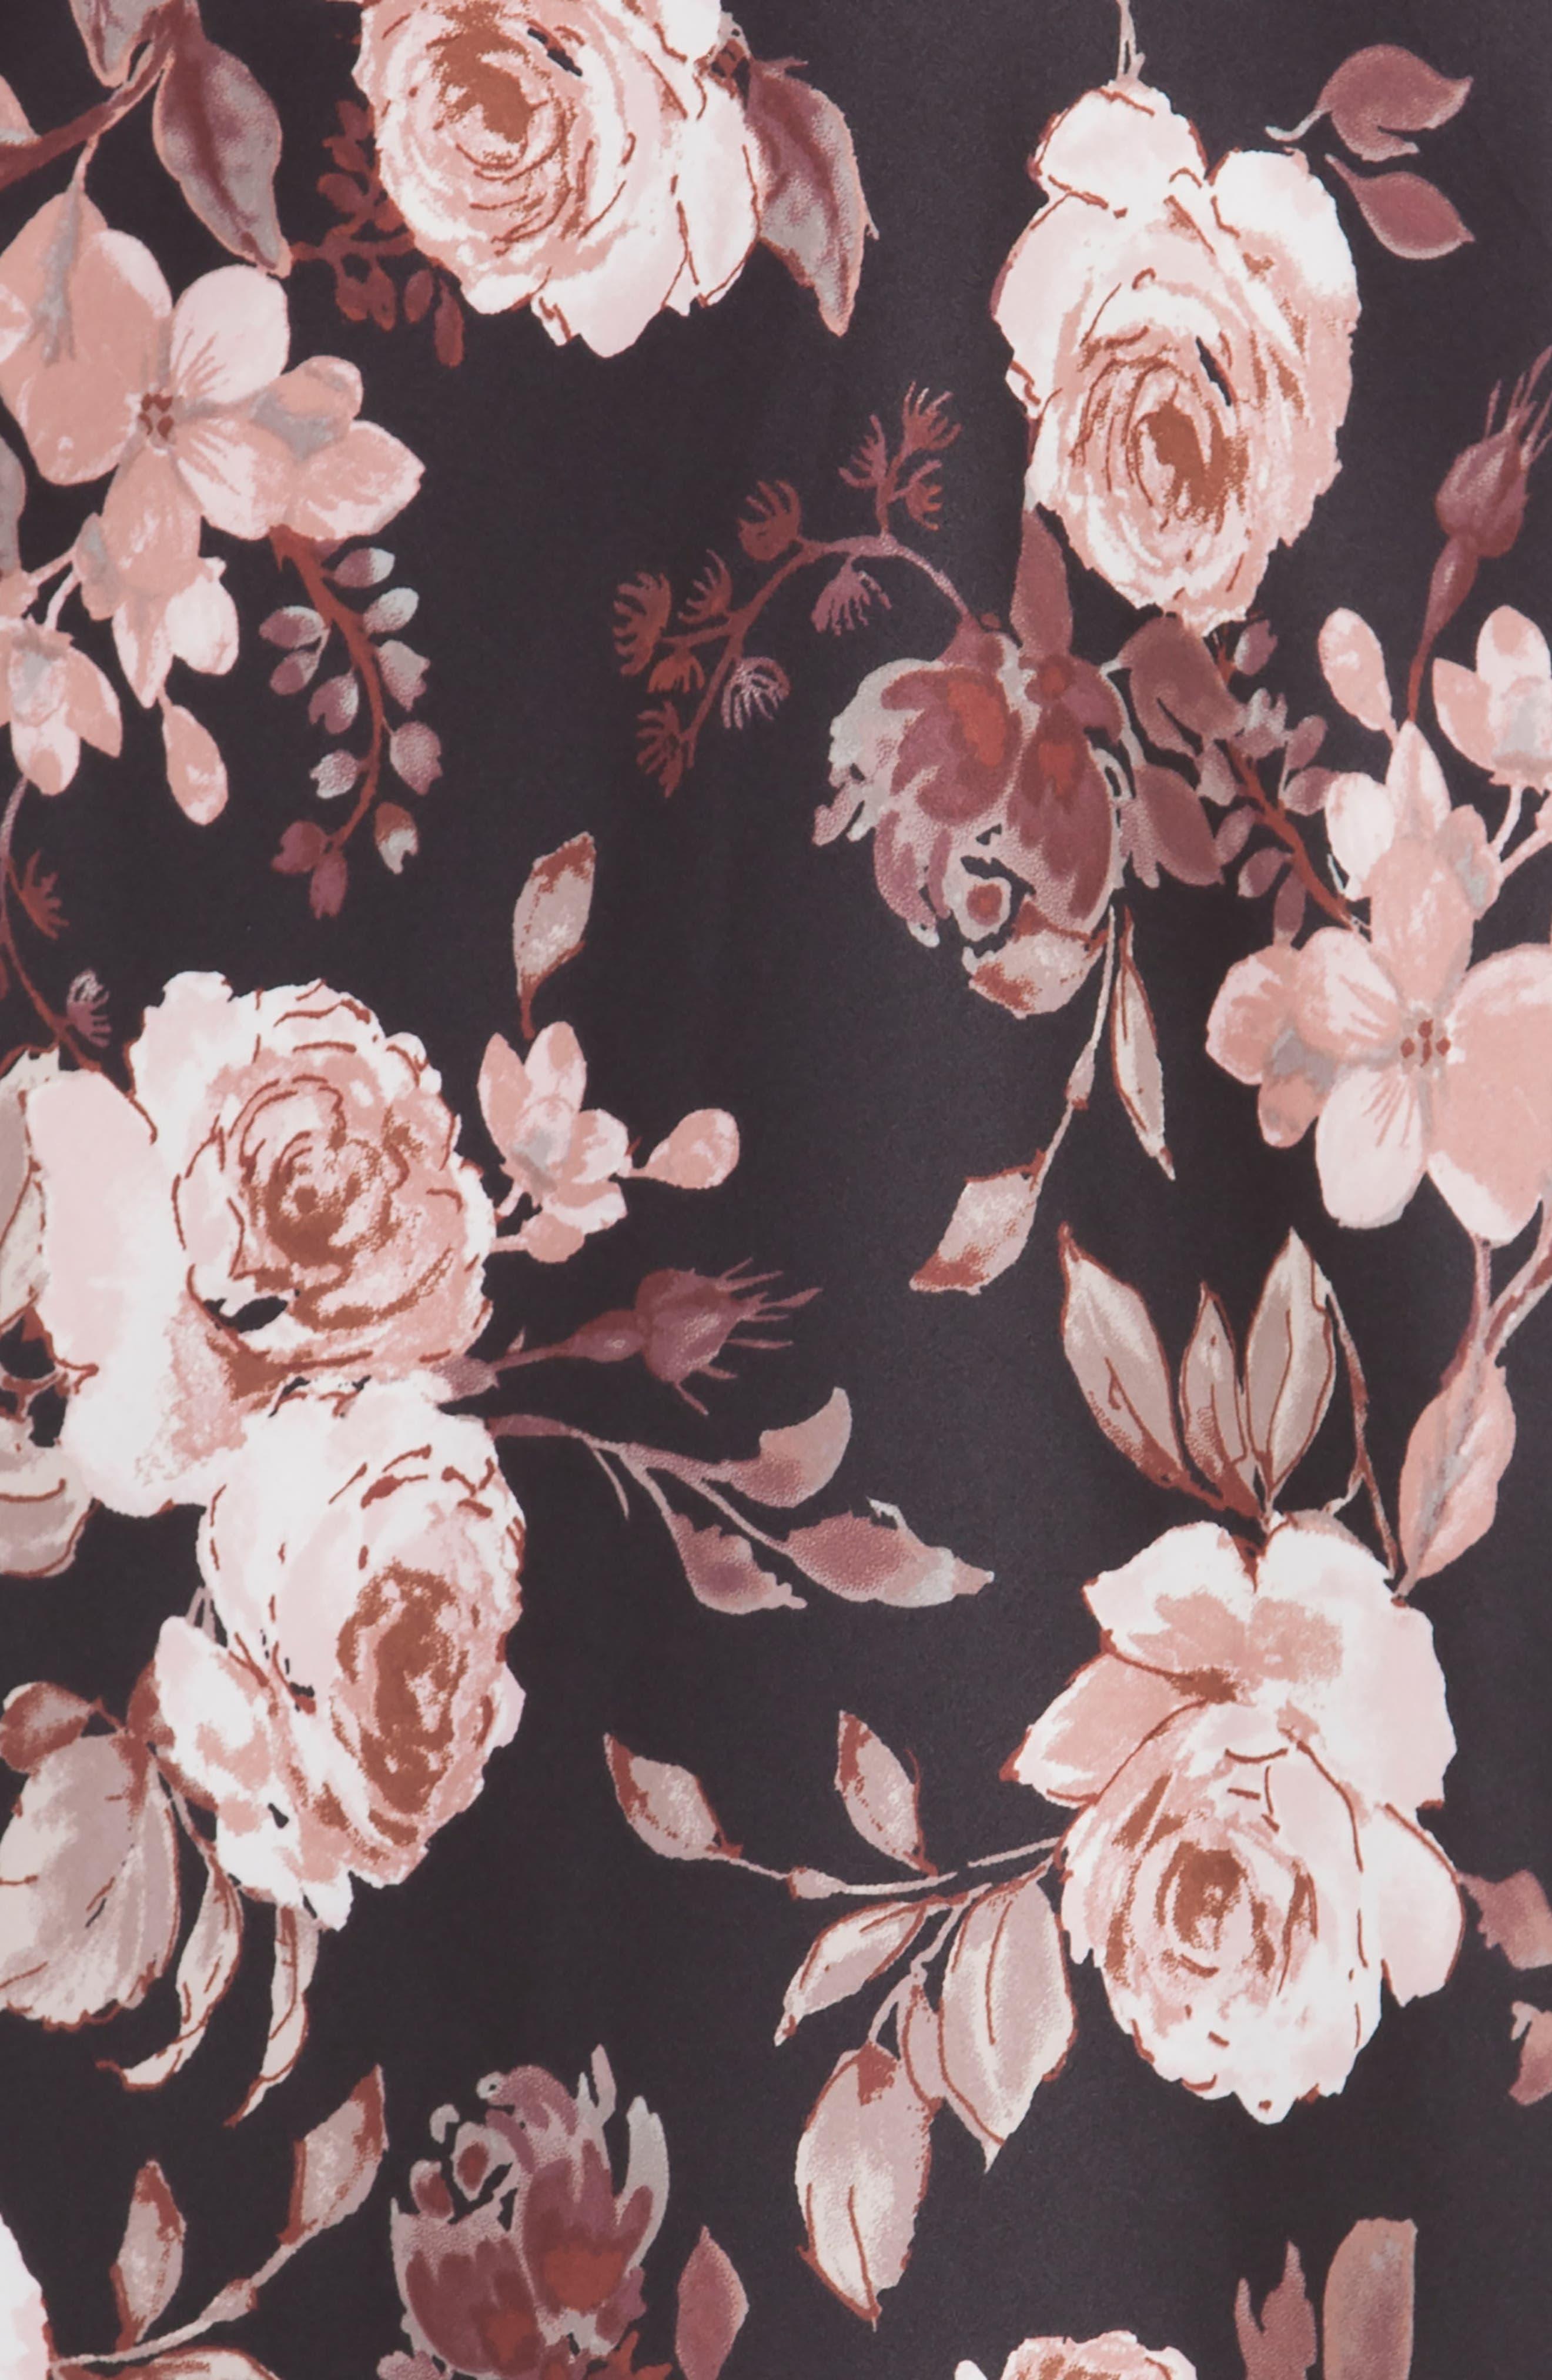 Floral Print Chemise,                             Alternate thumbnail 4, color,                             001